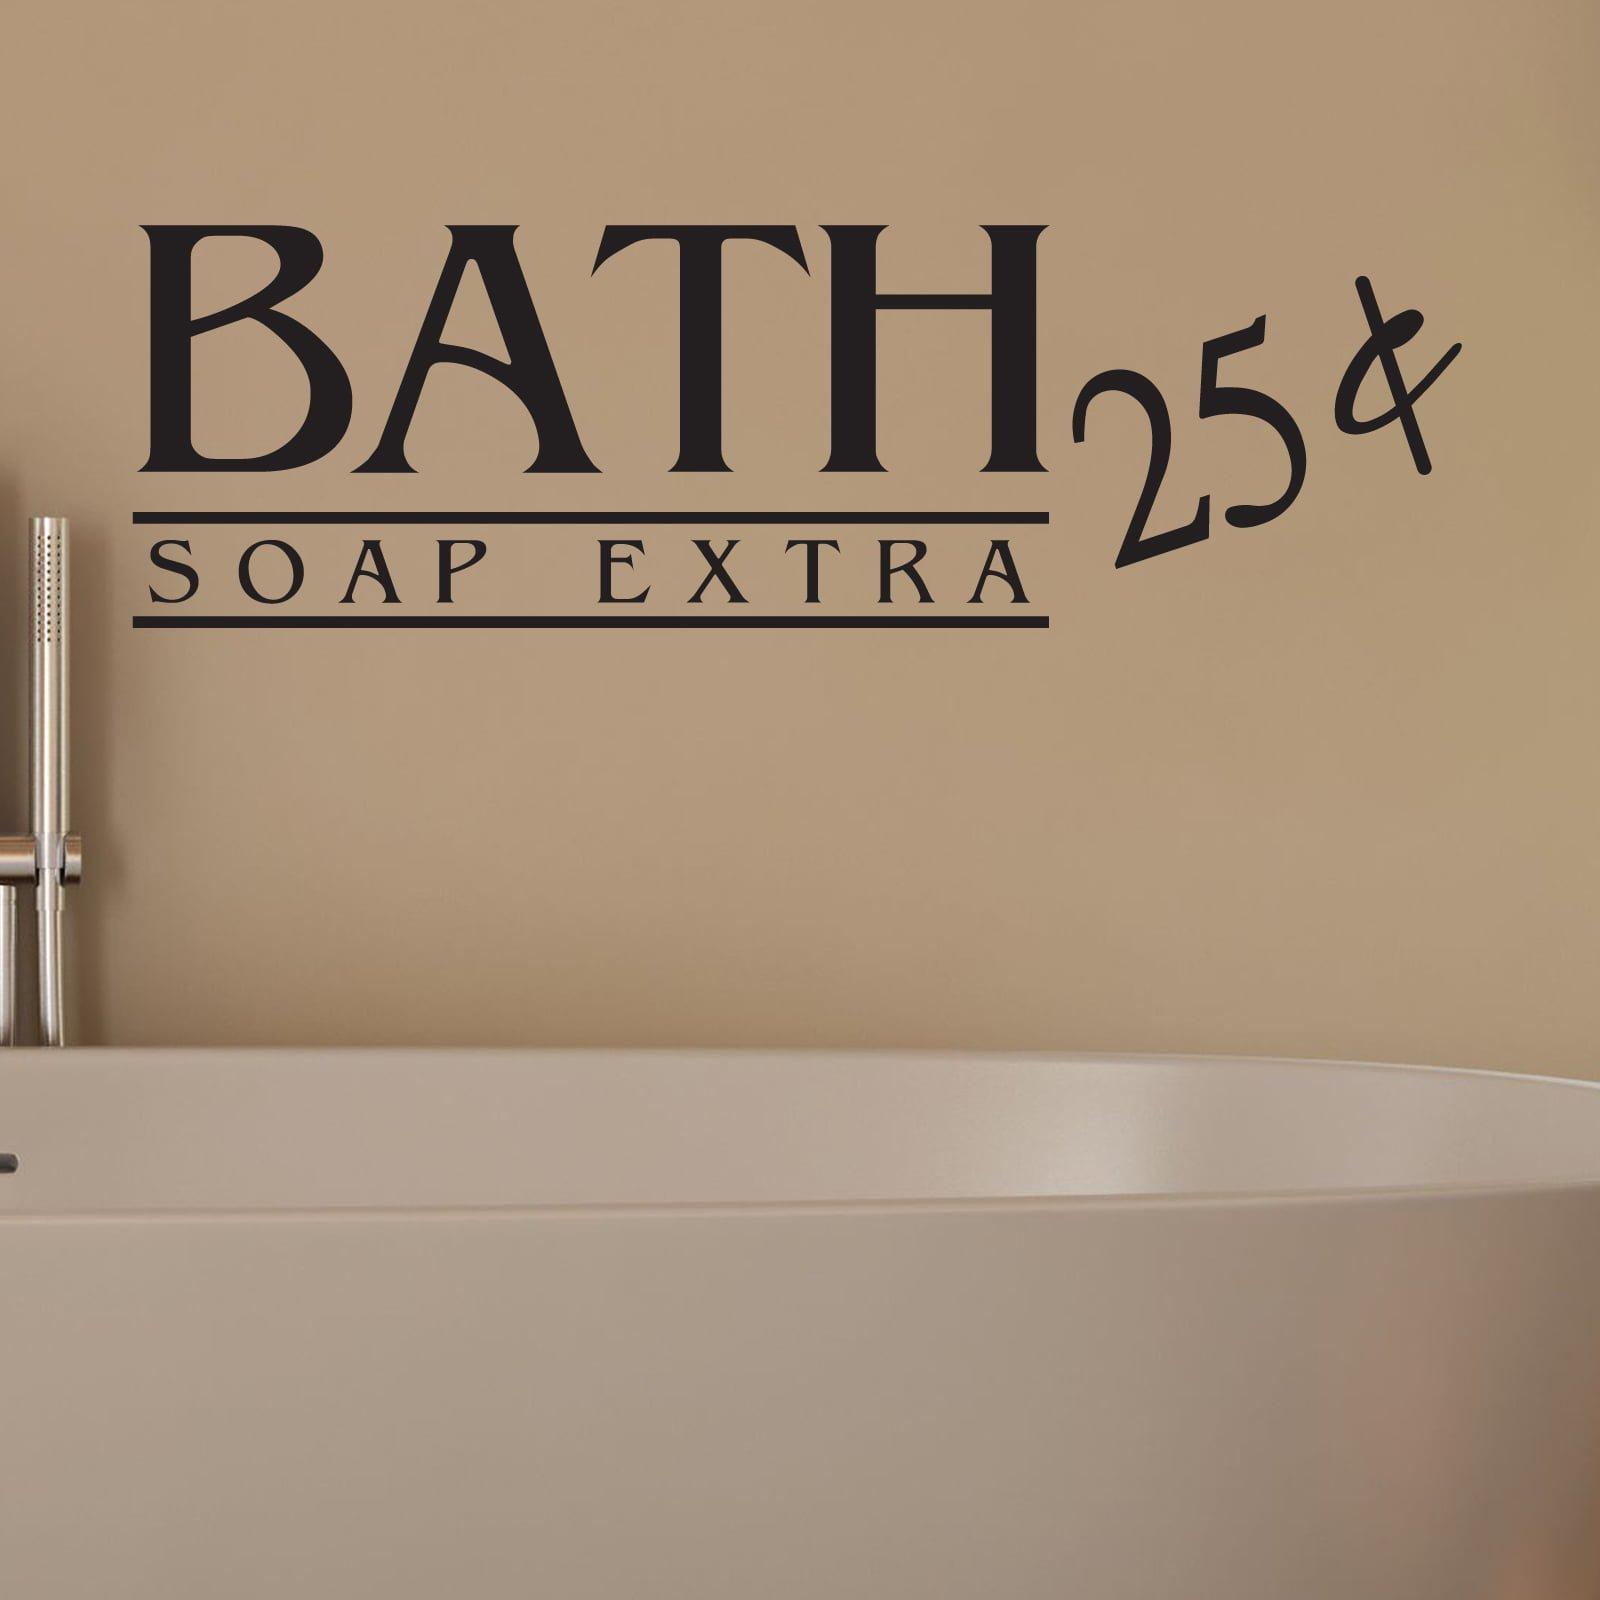 Bath Soap Extra Bathroom Wall Sticker World Of Wall Stickers